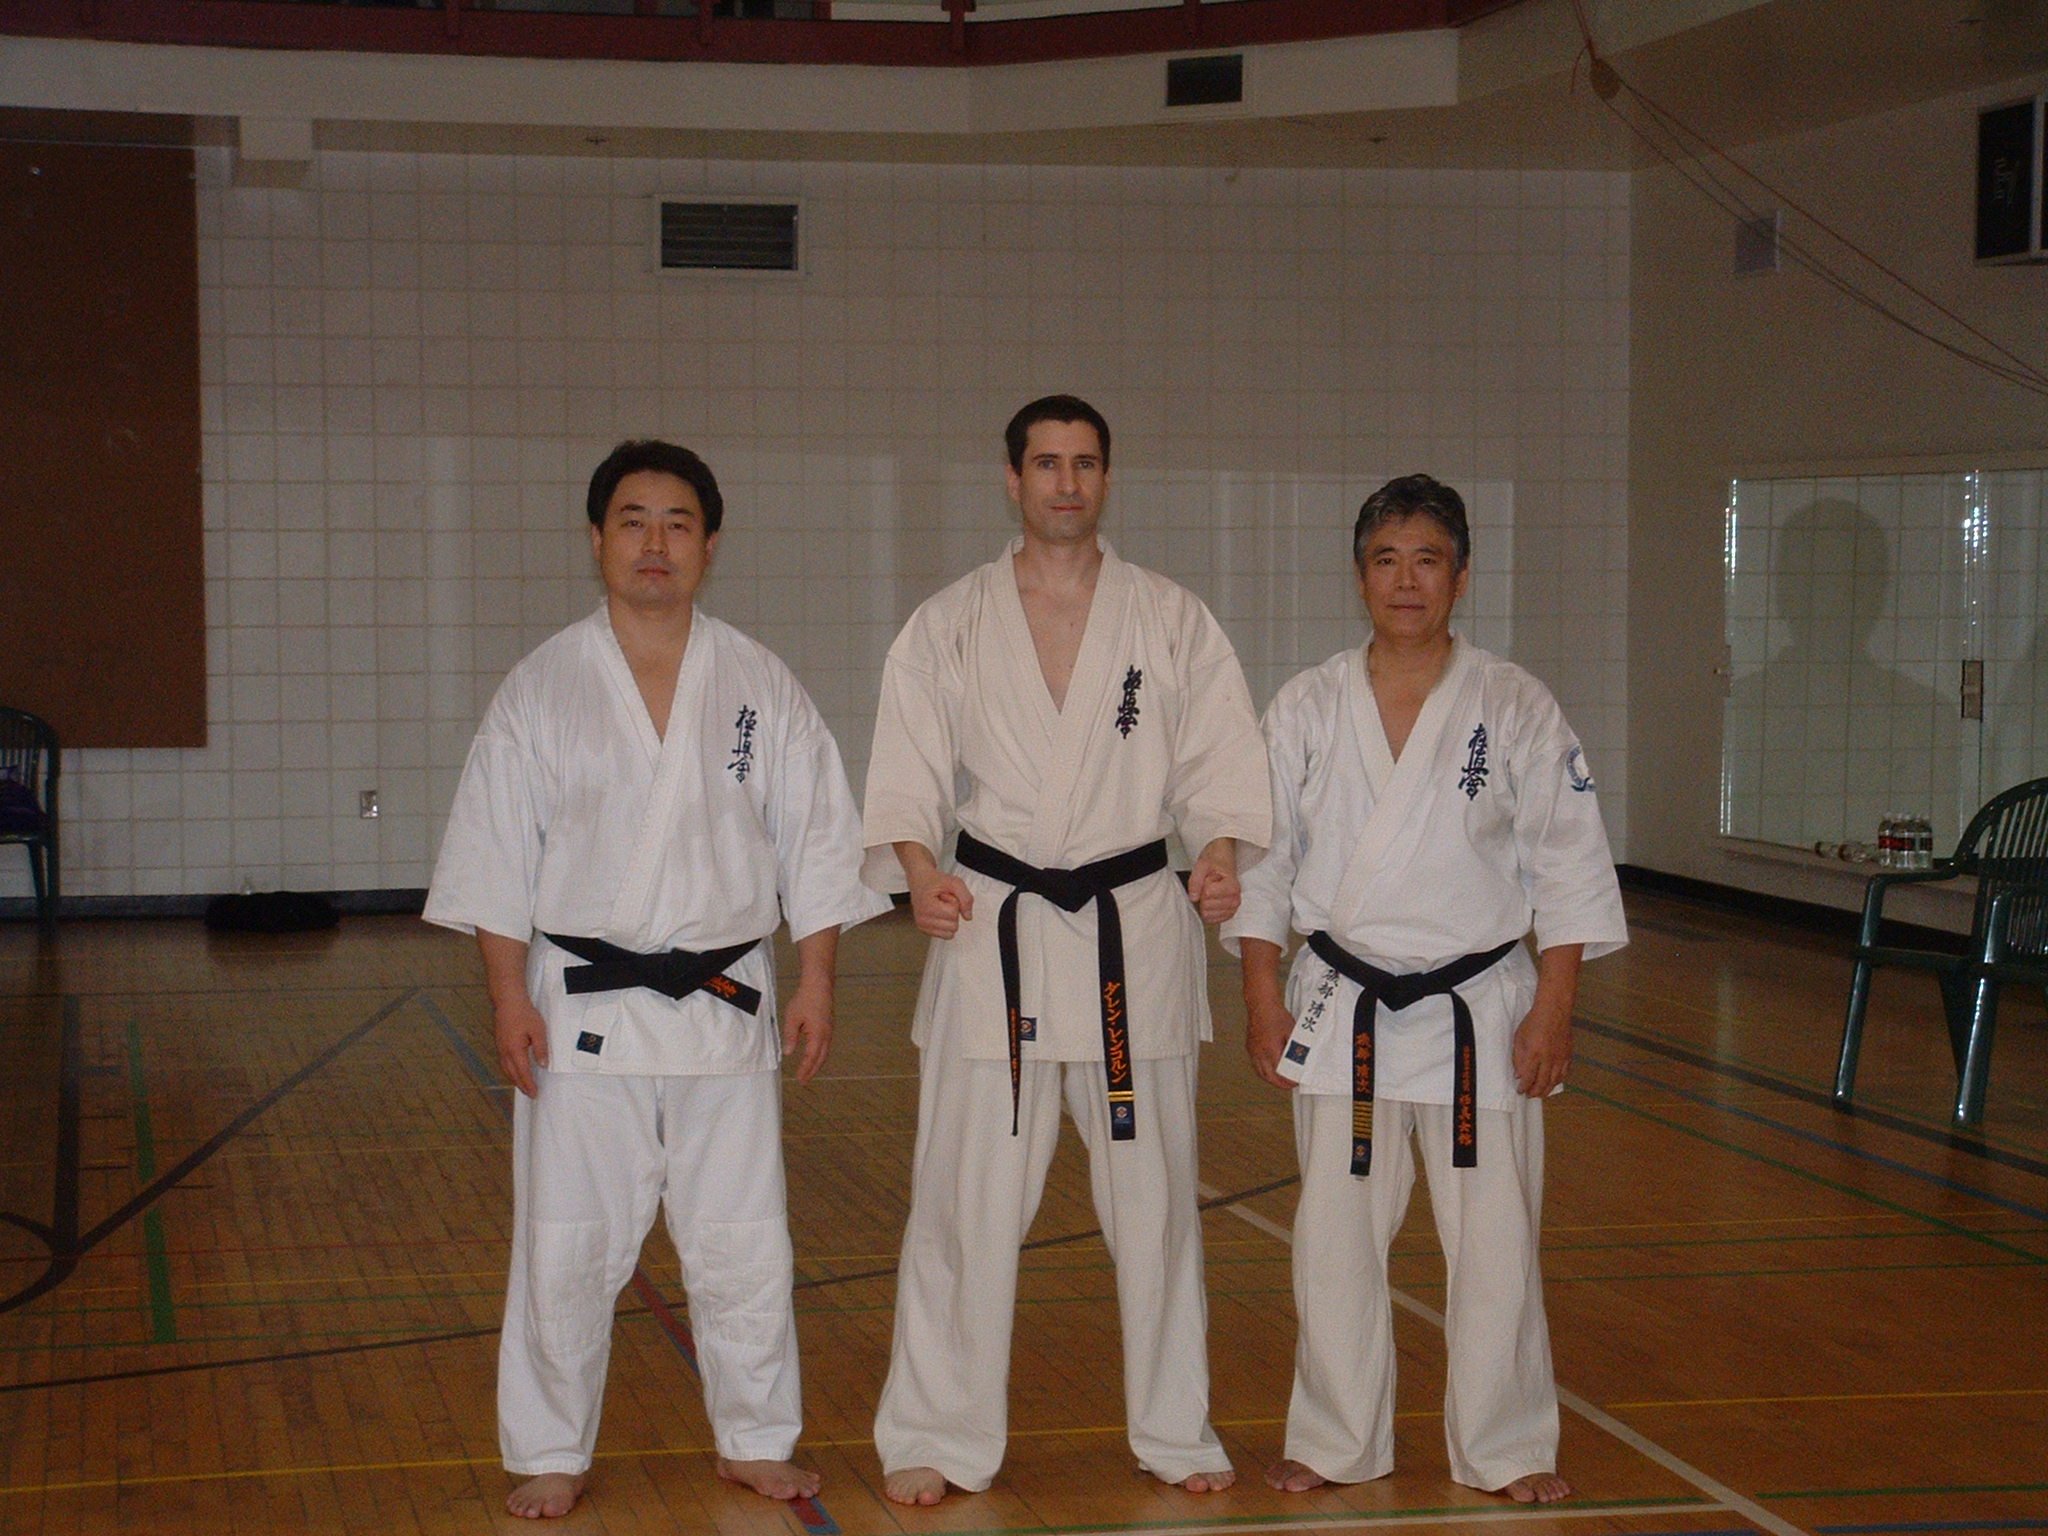 Kancho shihan Isobe and darren 2004.JPG